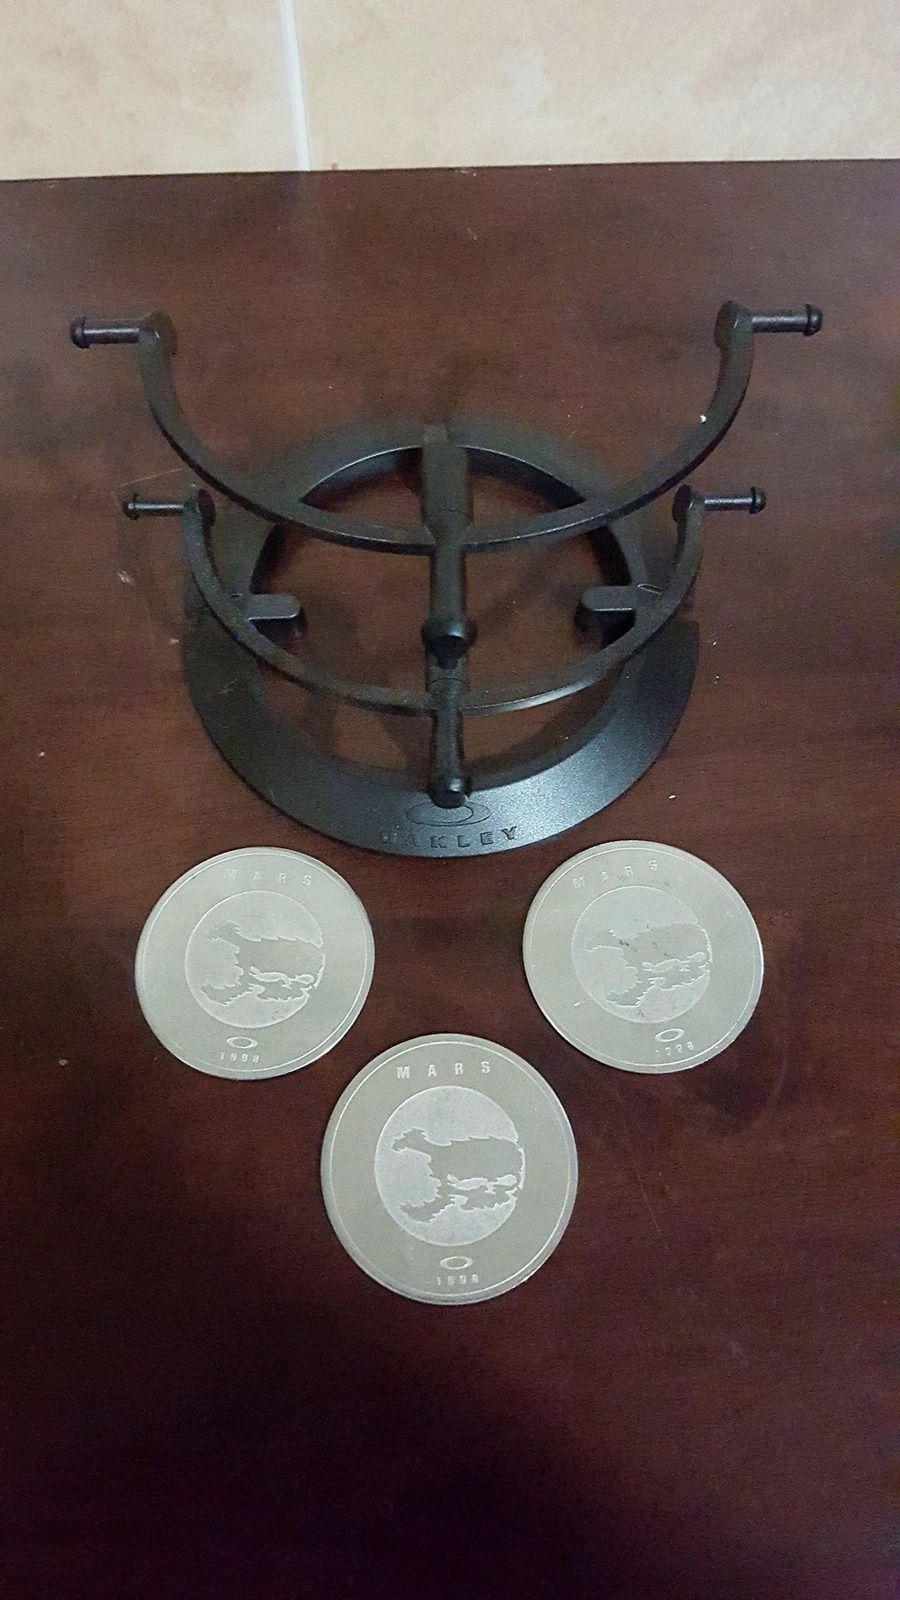 Mars coin and 2 tier stand - 20150921_203214_zpsajwegstq.jpg